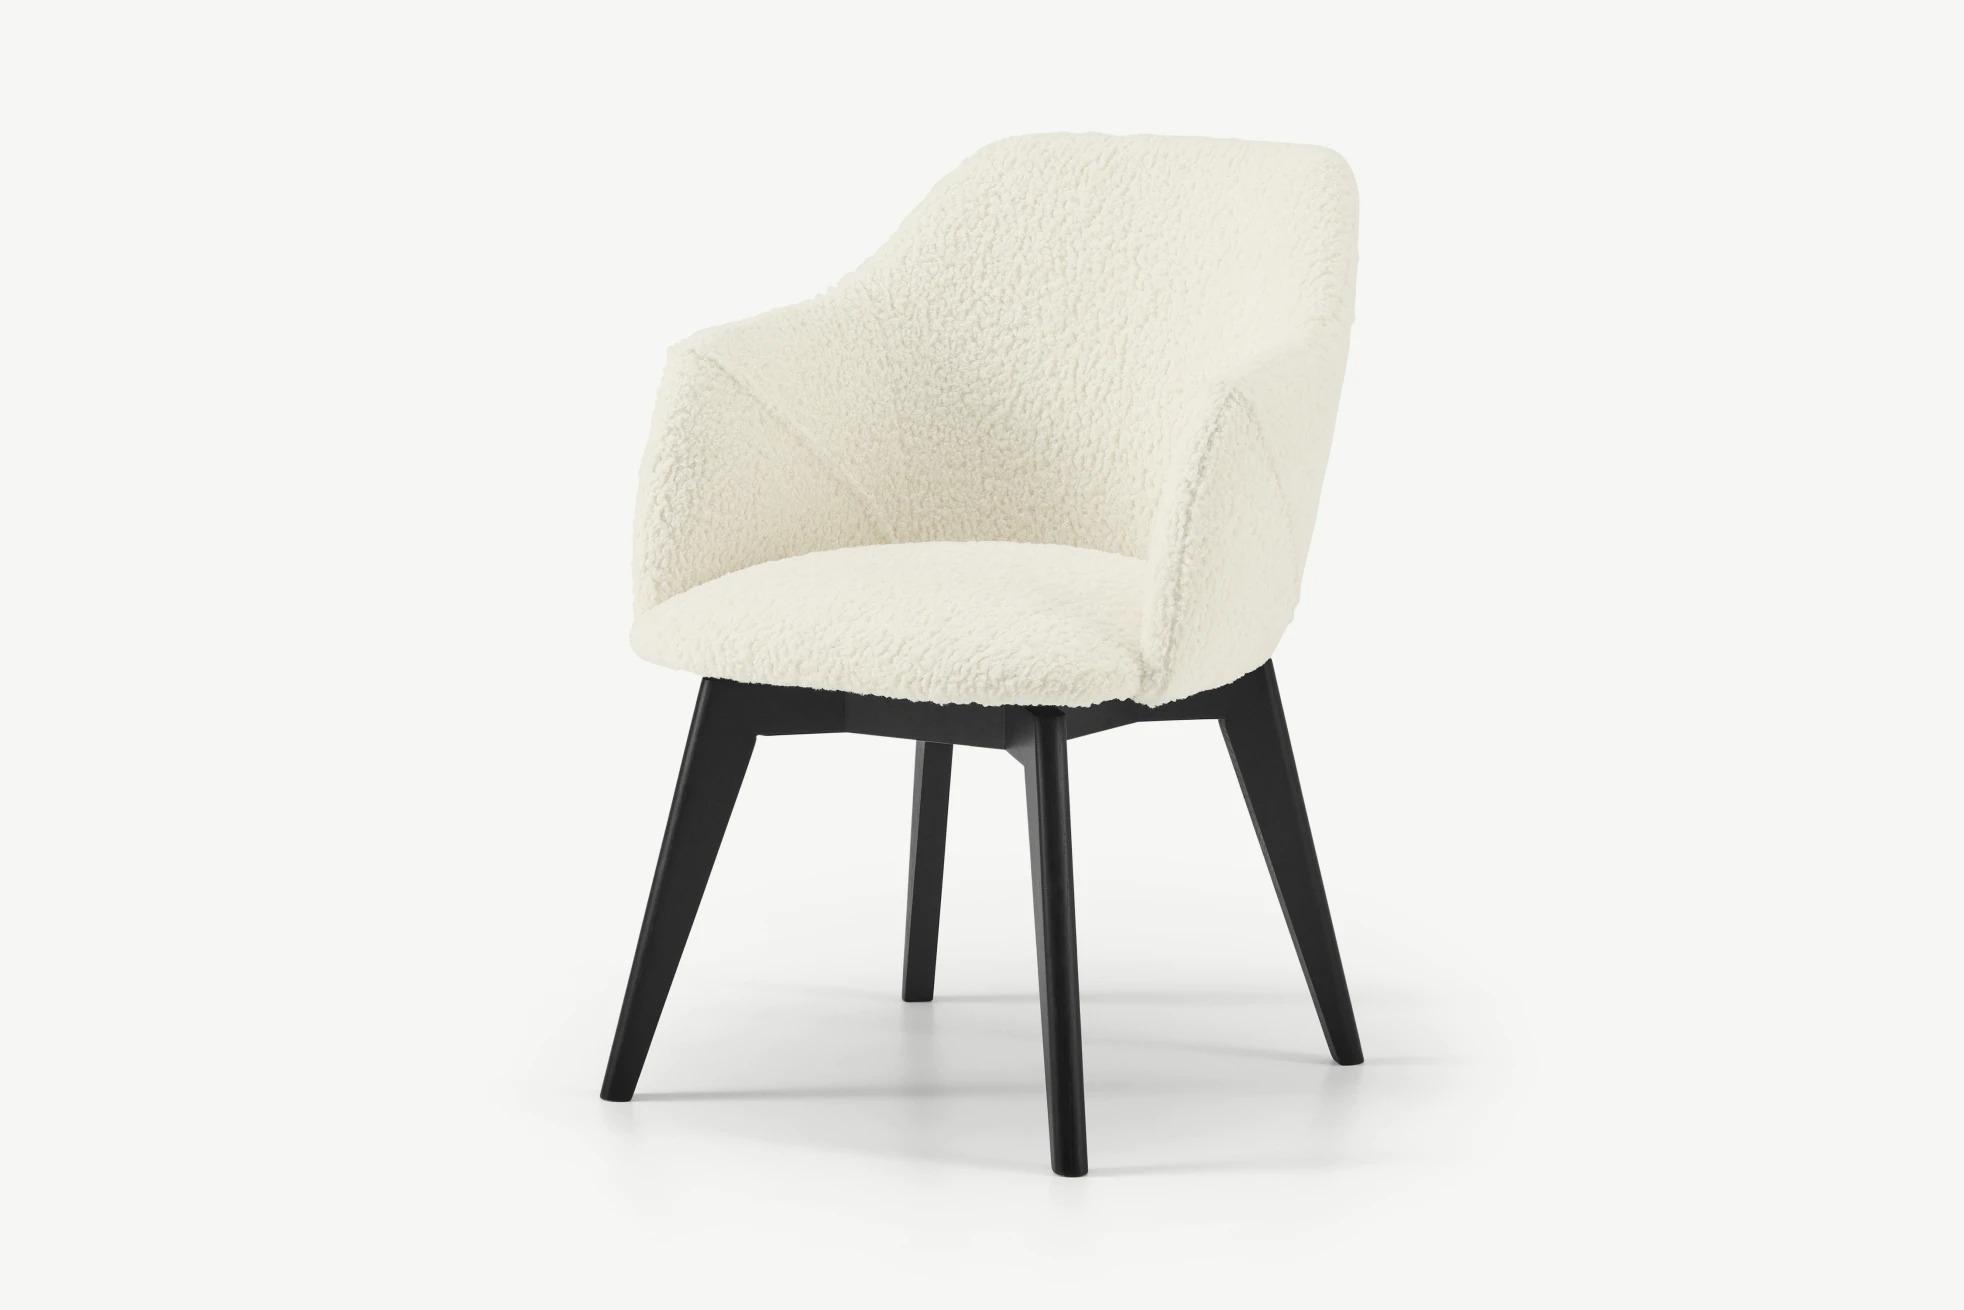 Lule silla de oficina, piel de oveja sintética con patas negras